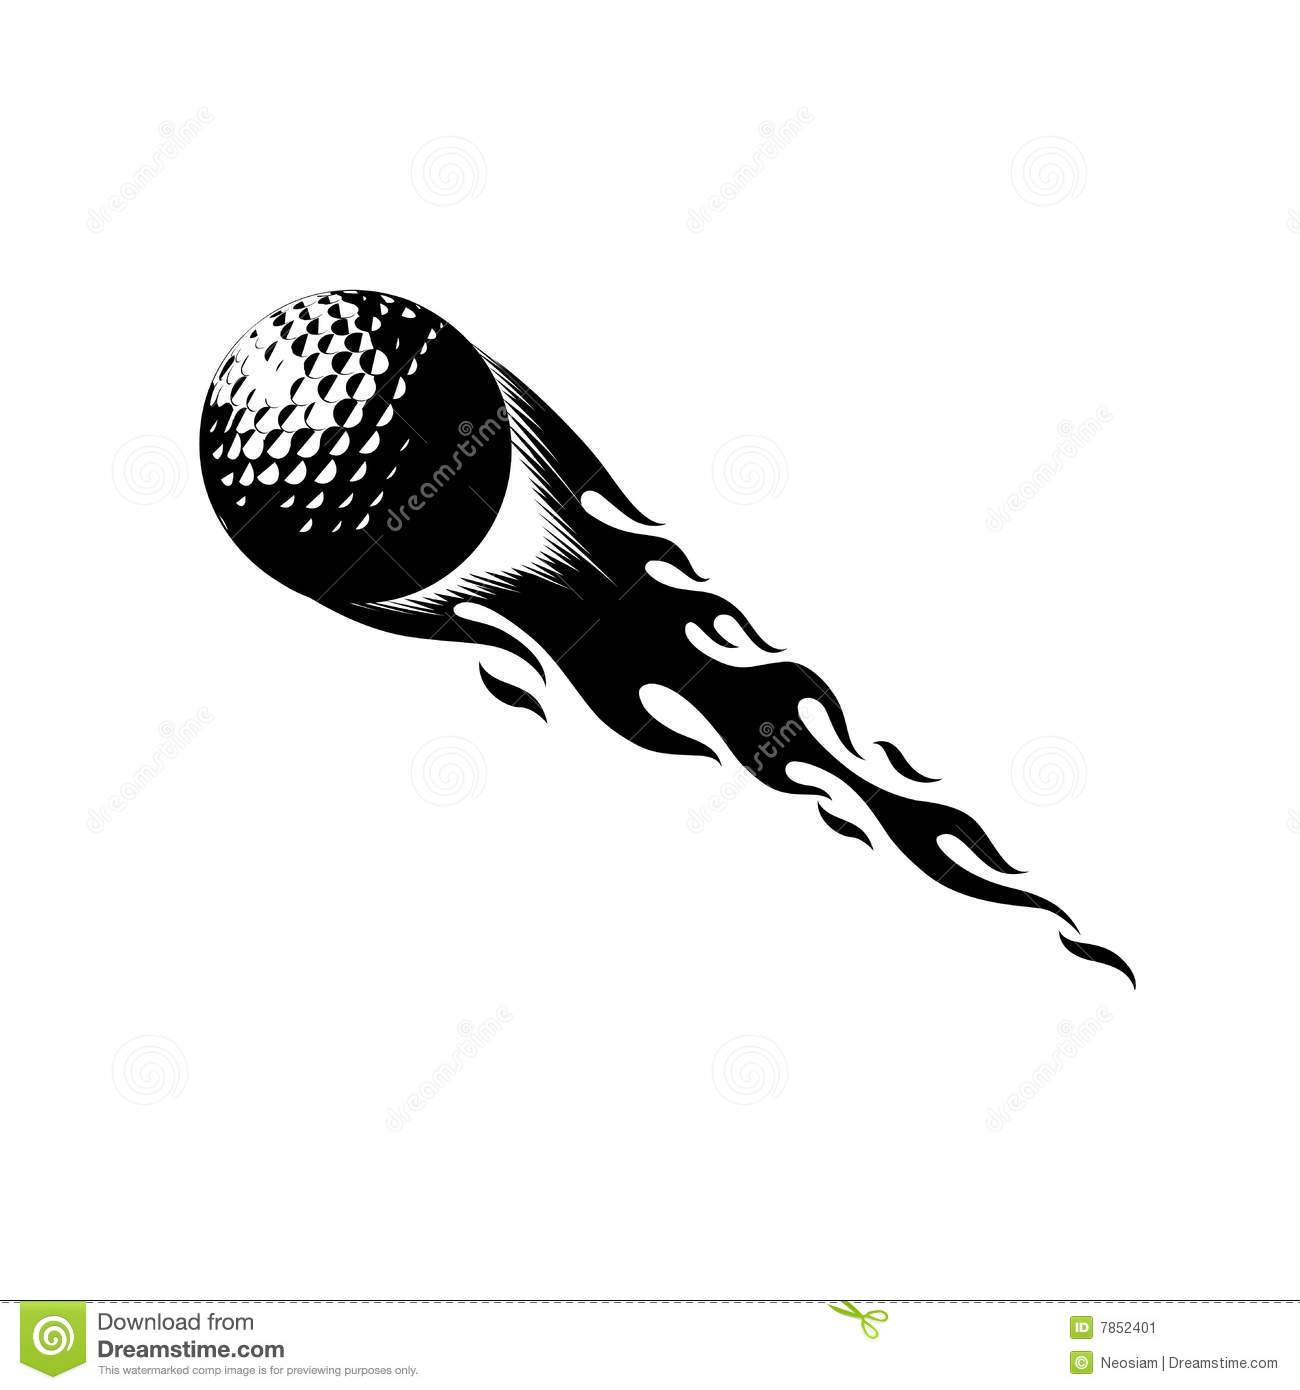 Flaming golf ball clipart svg Flaming golf ball clipart - ClipartFest svg